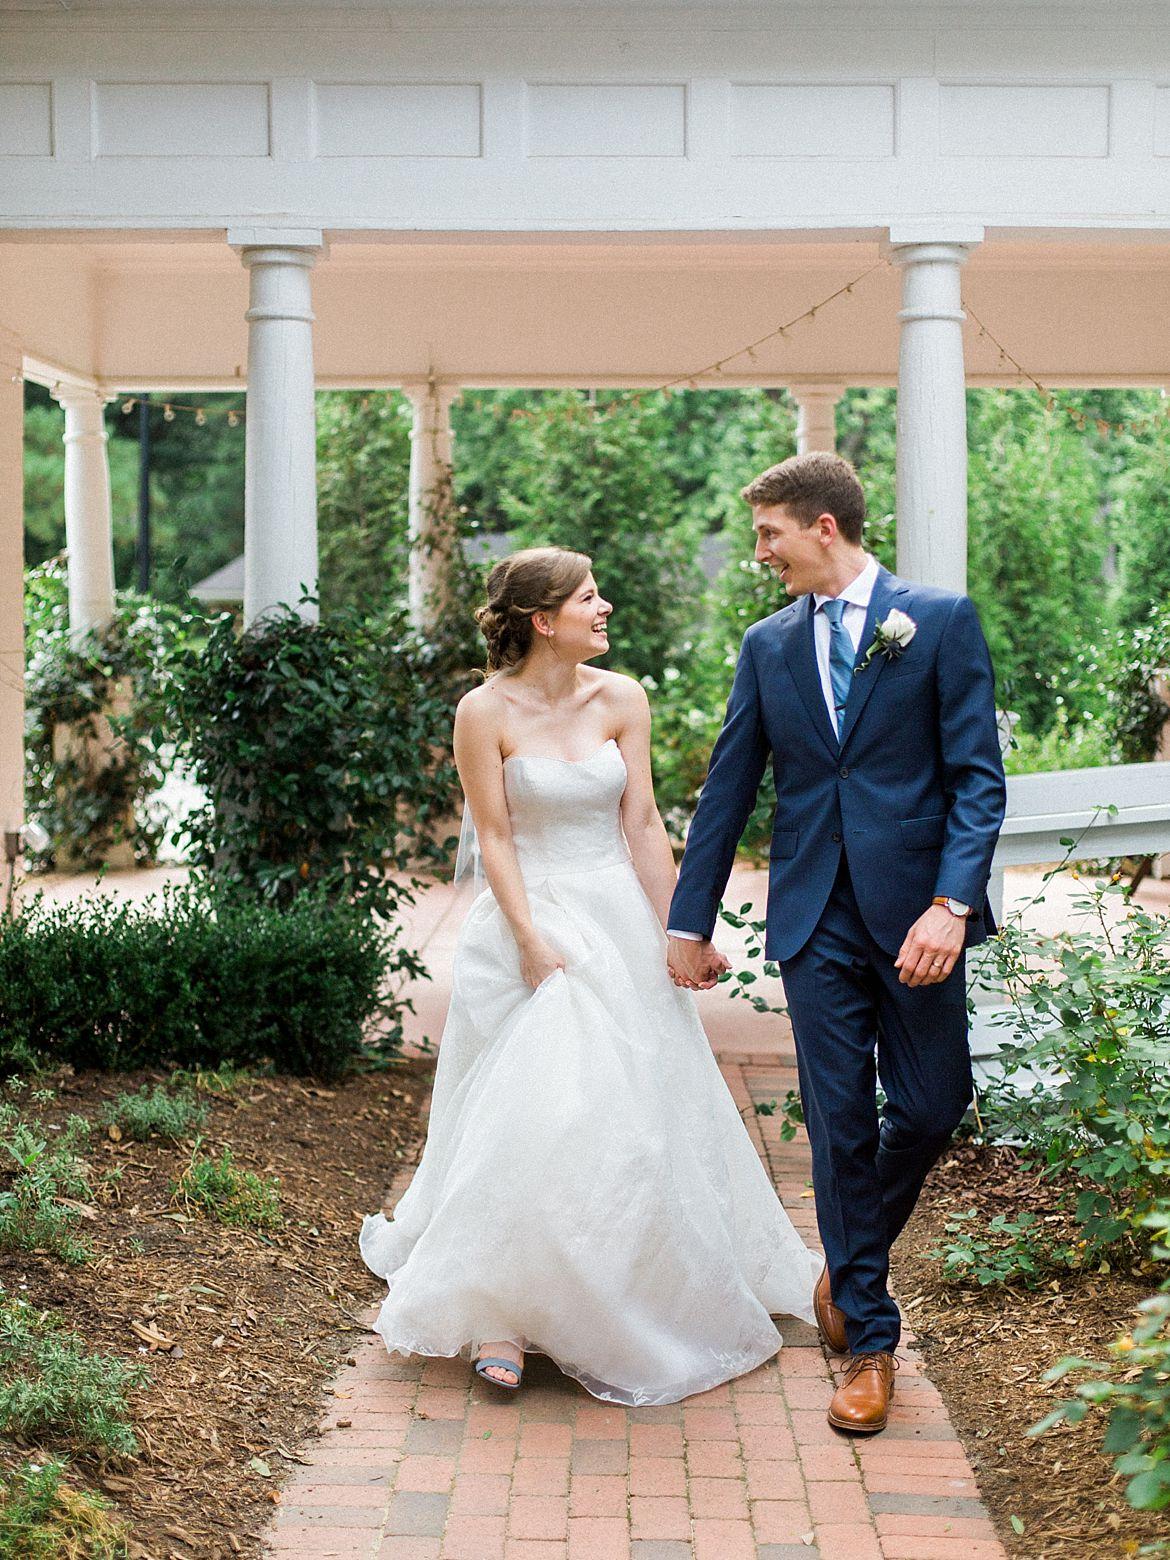 Pop Up Wedding Photography